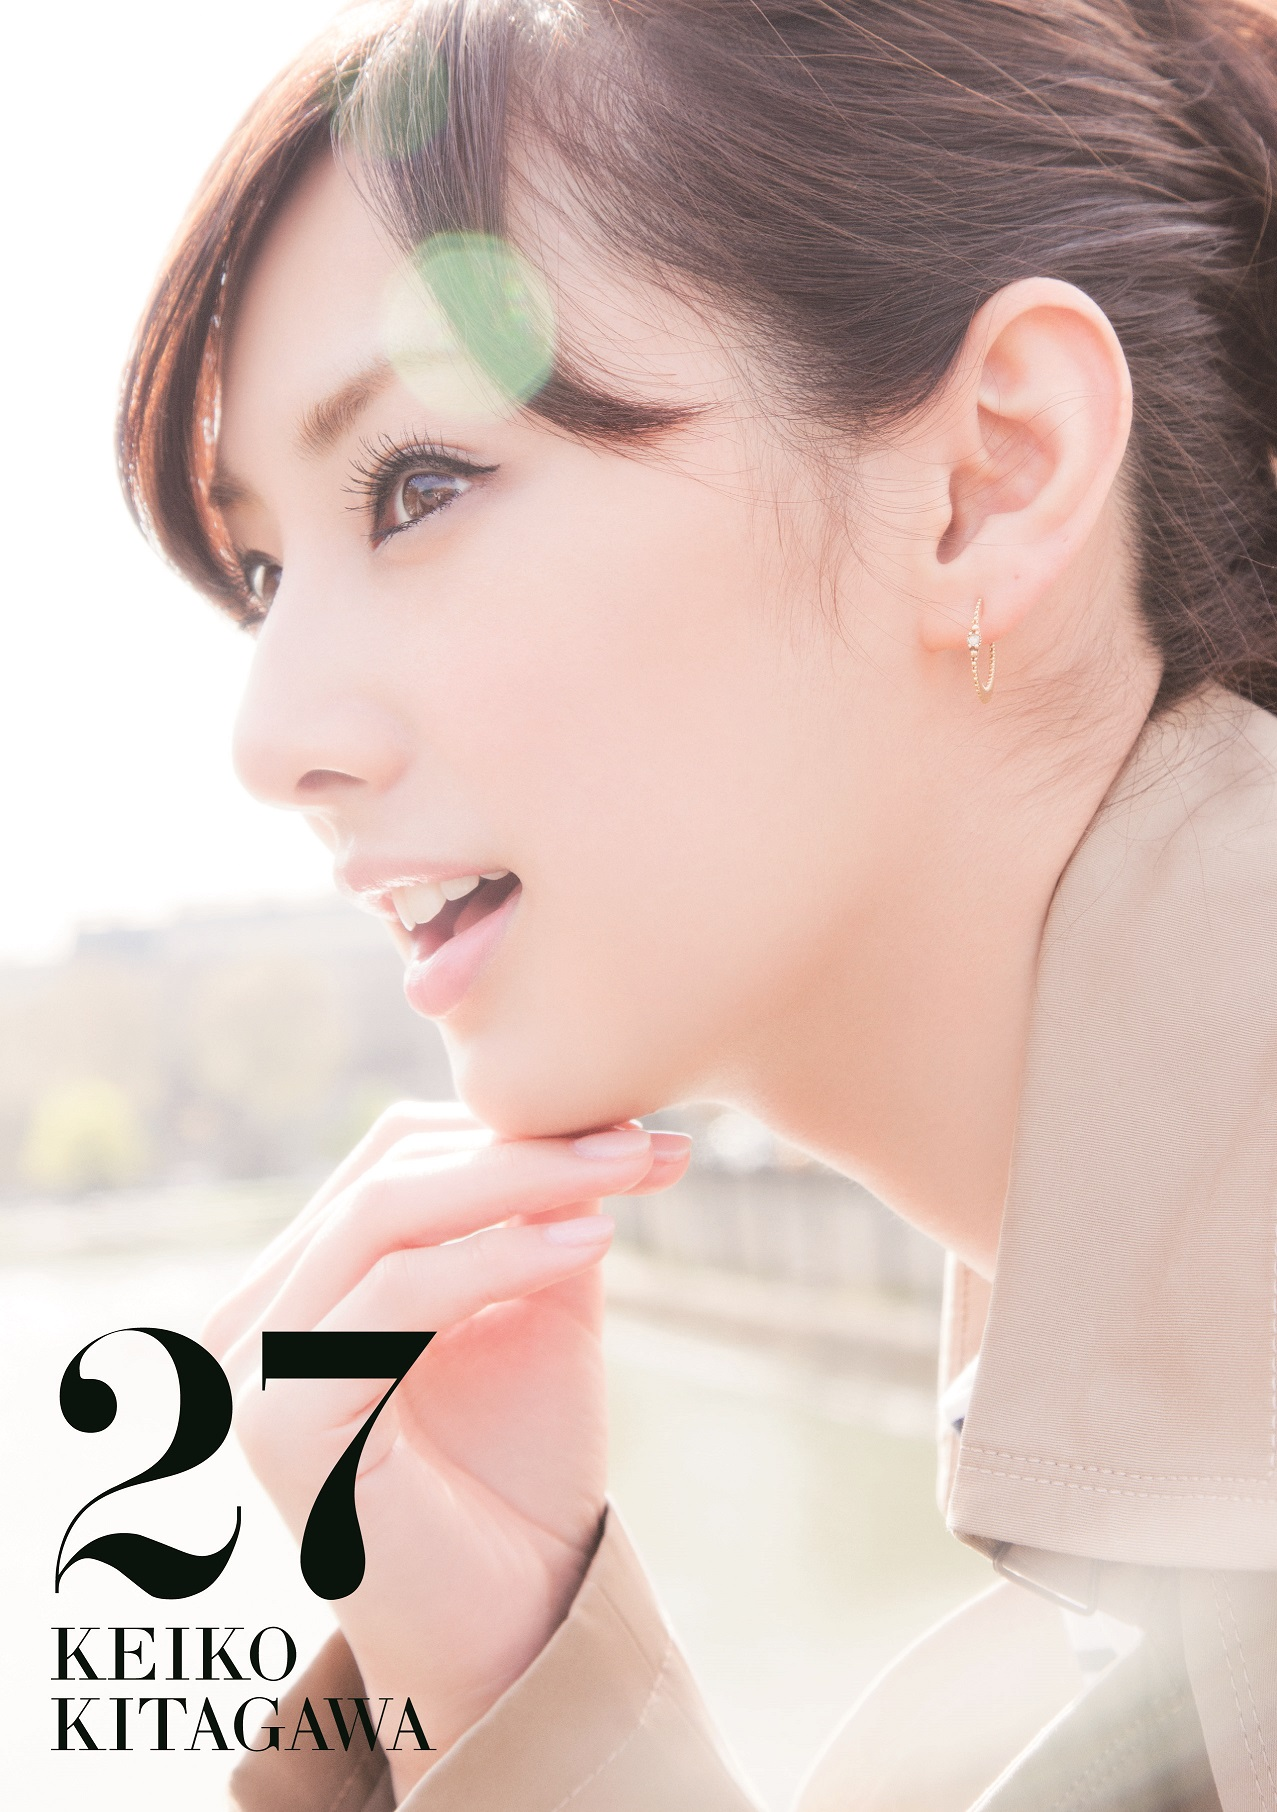 KK_COVER_amazon牁Ejpg.jpg